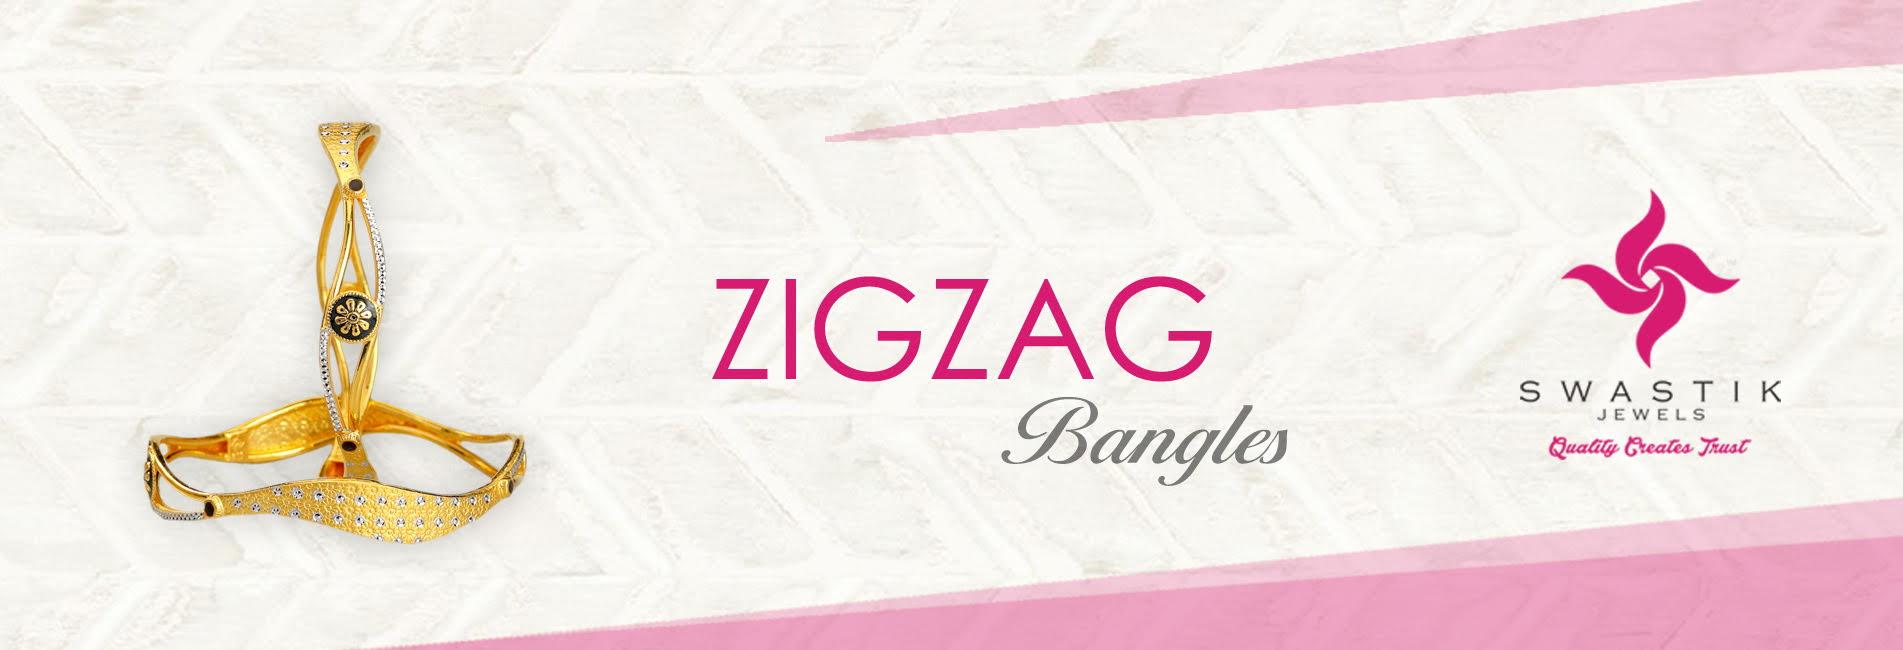 ZigZag Bangles